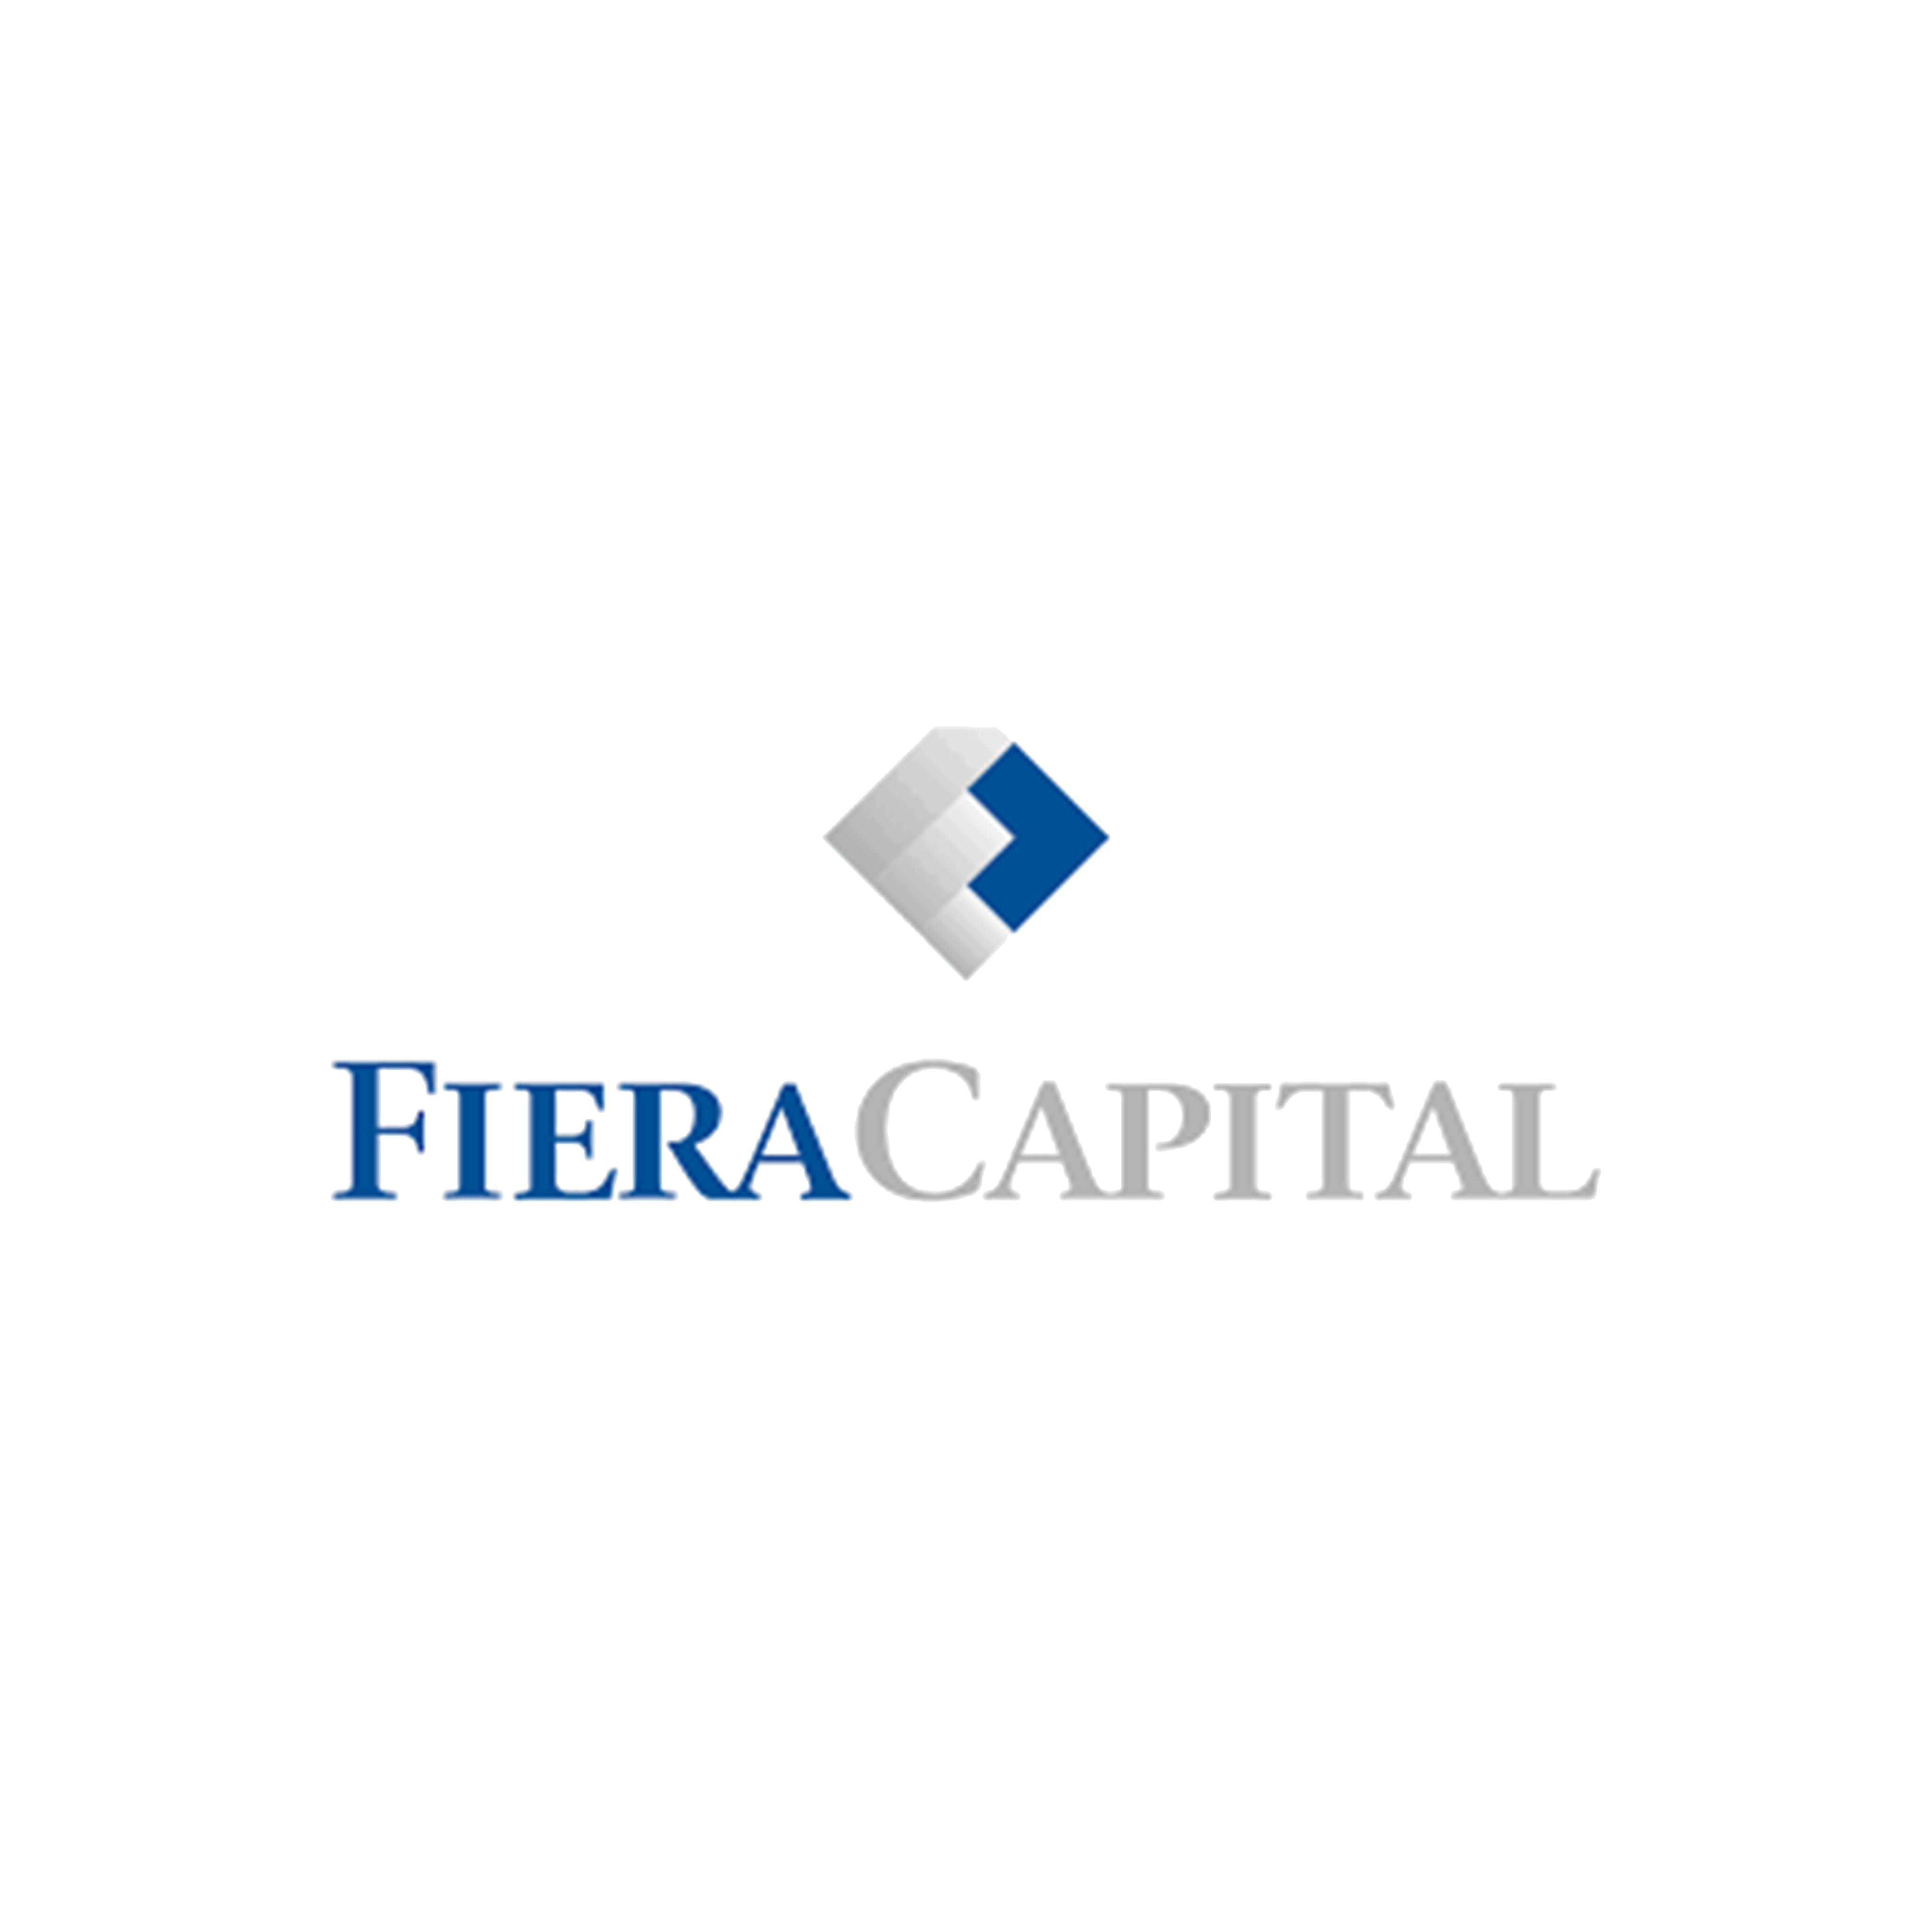 Gresham-Customer-Logos_0008_Fiera-Capital